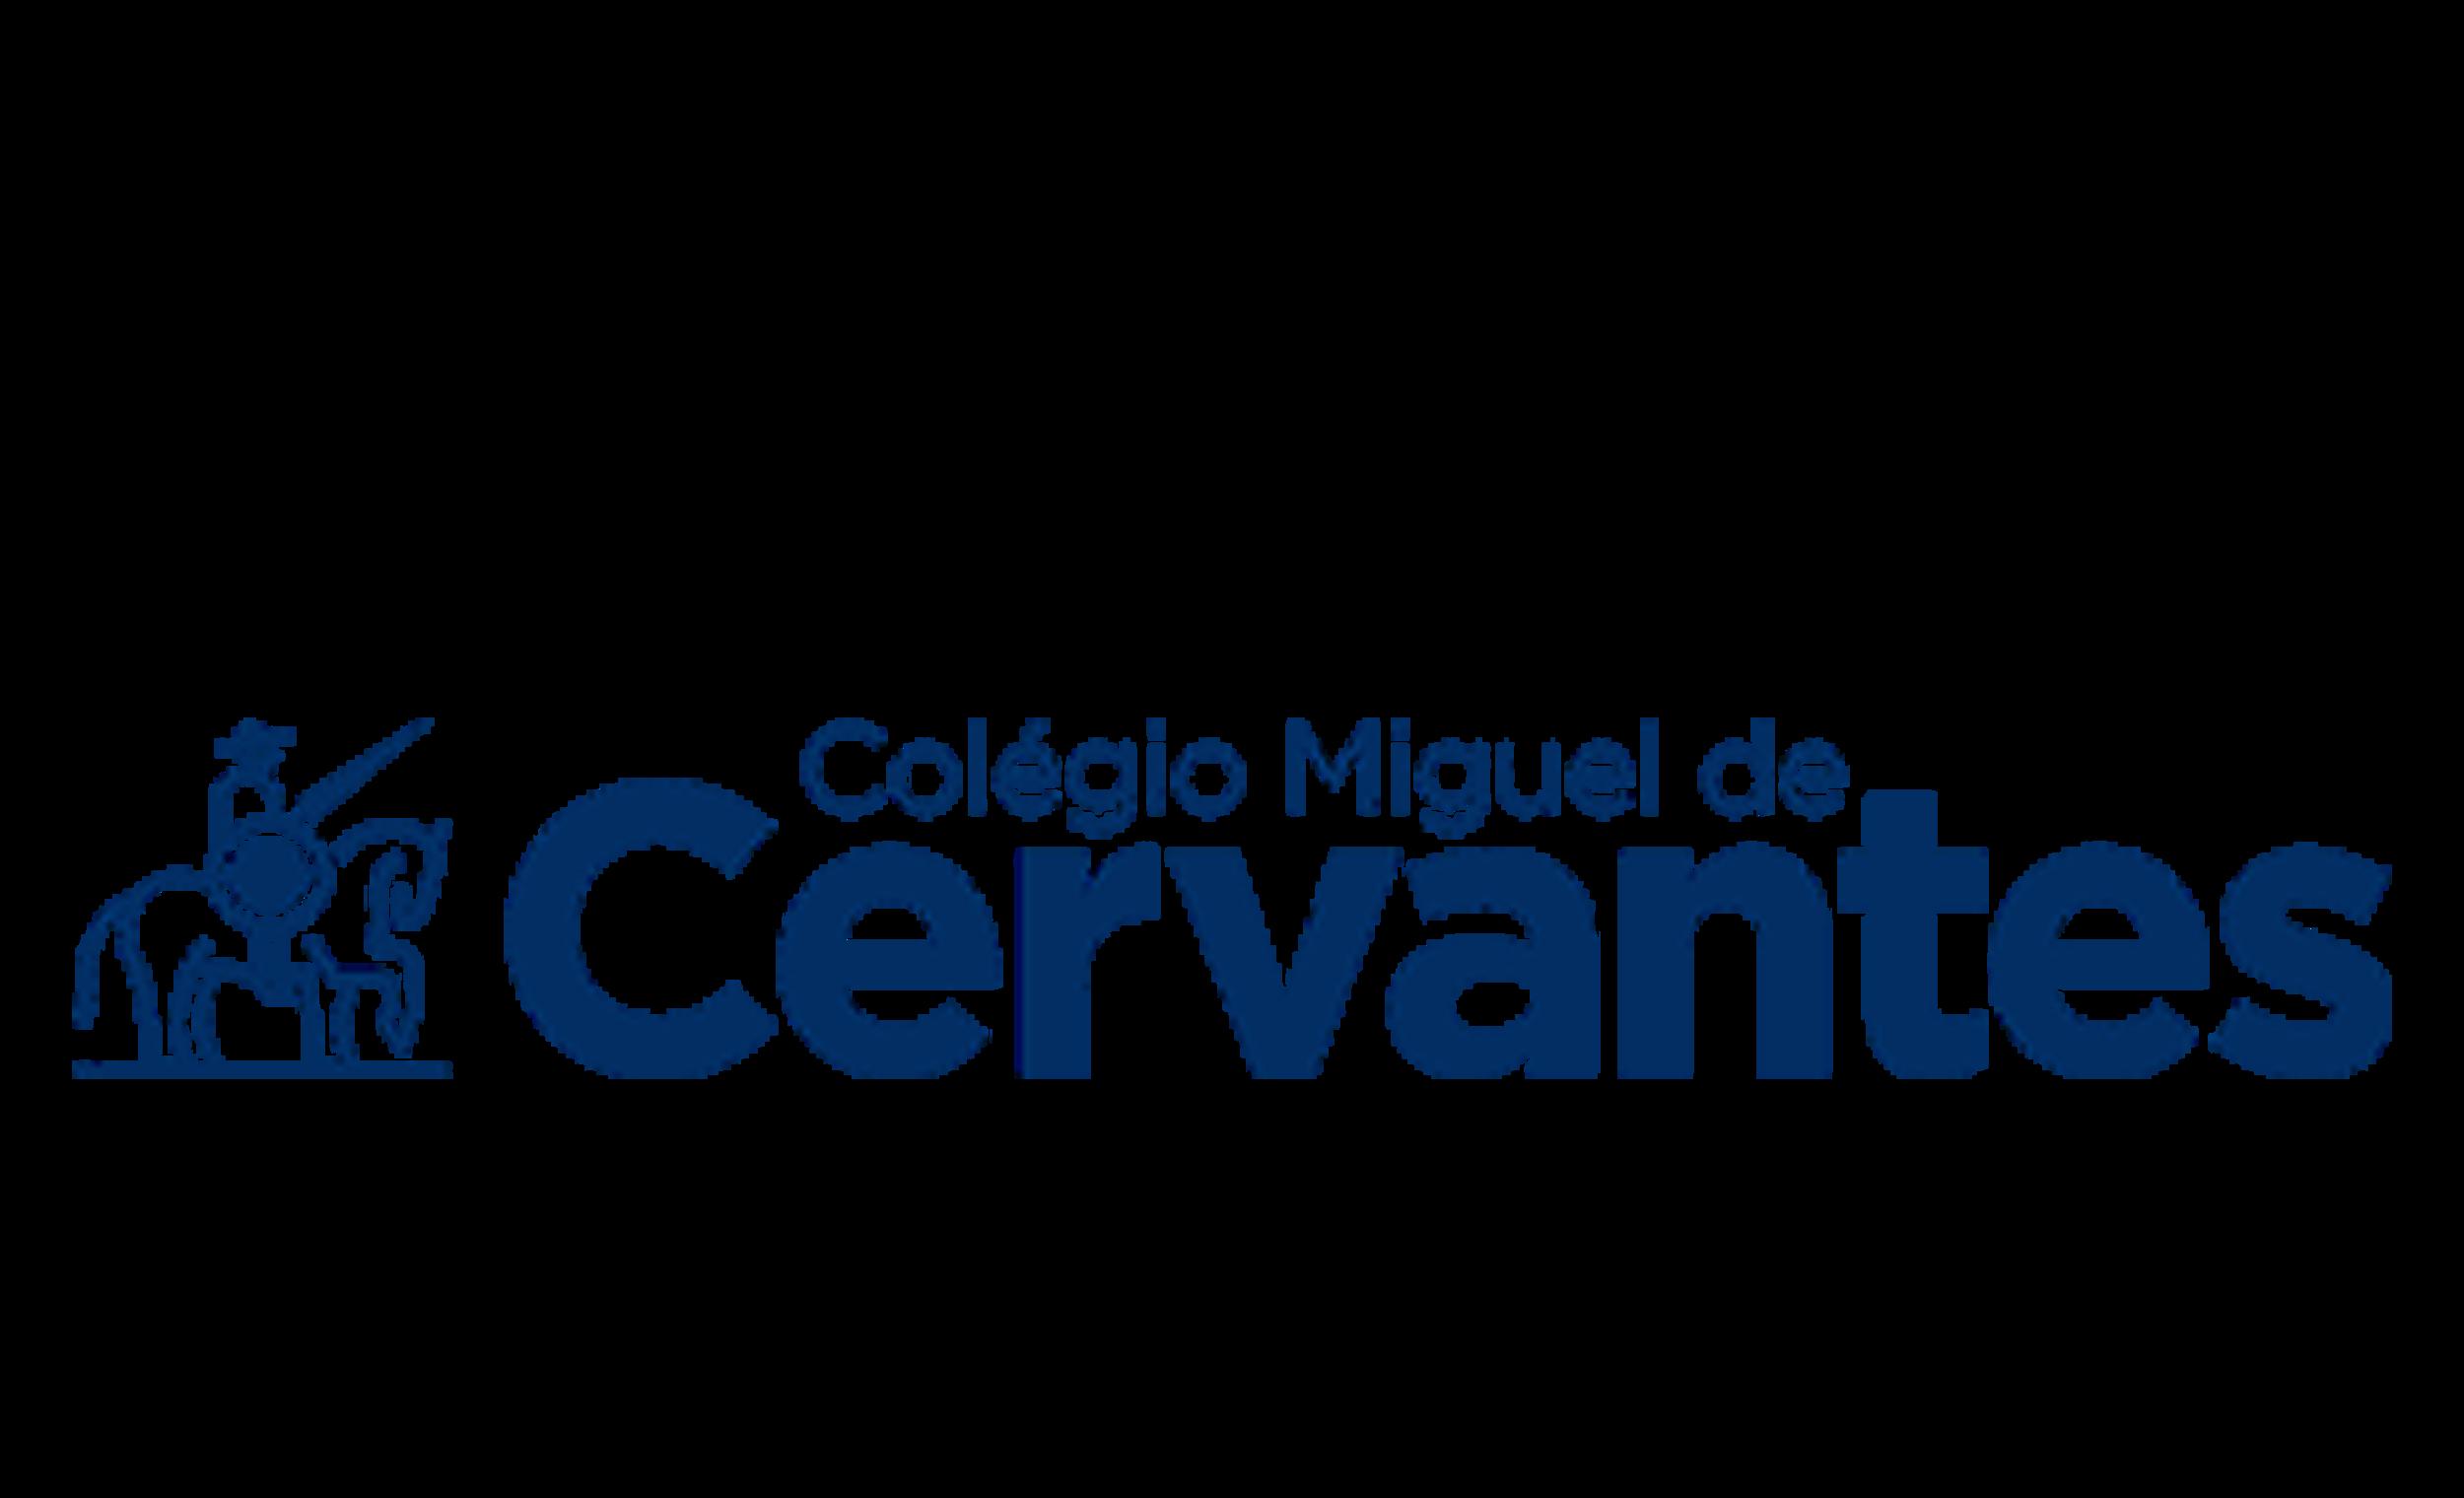 _0022_Miguel-de-Cervantes.png.png